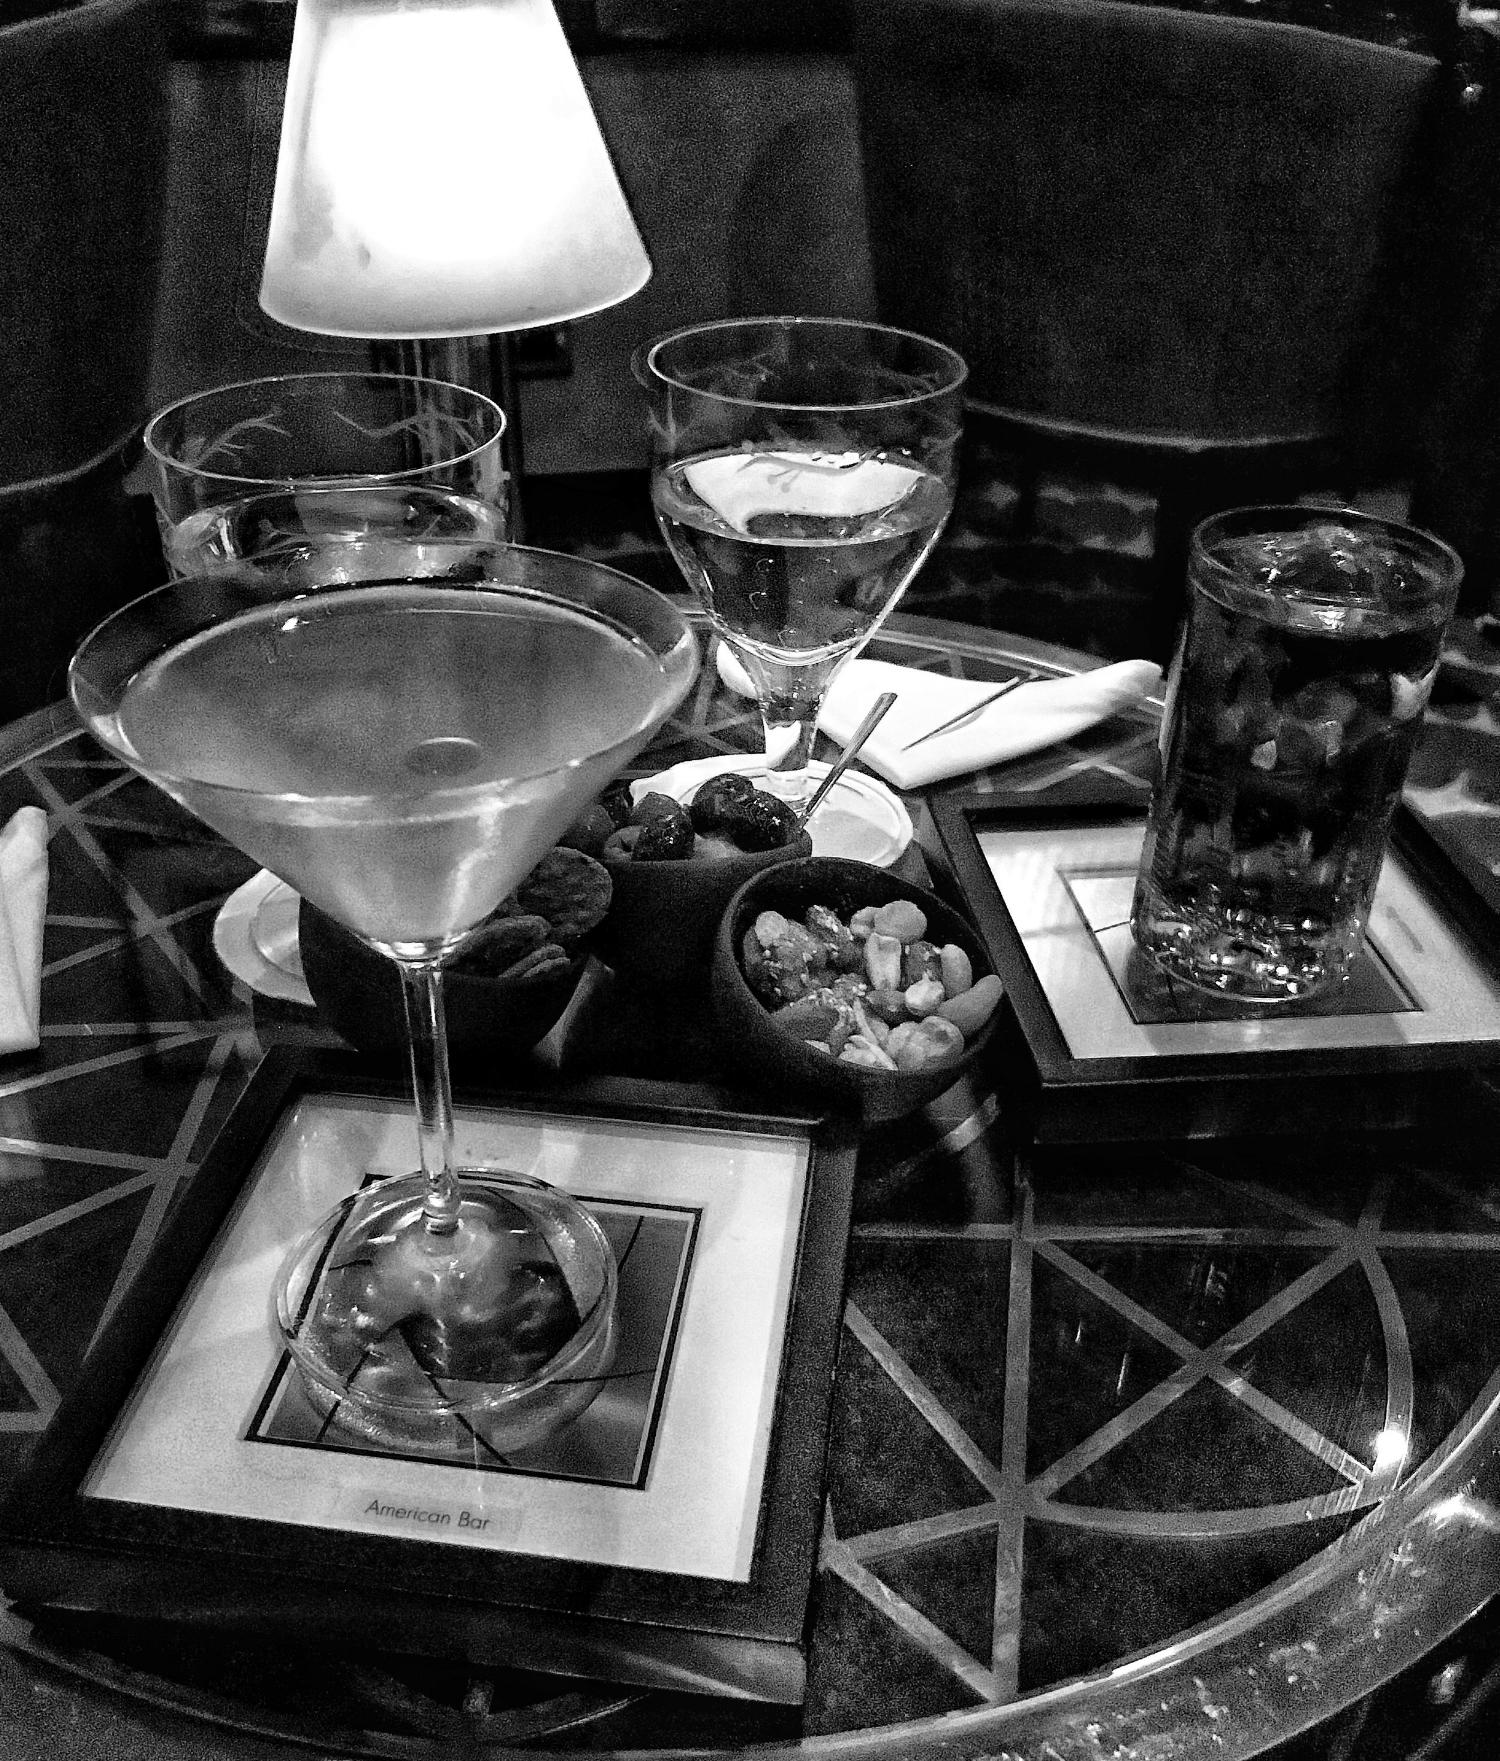 Martini at The American Bar, London